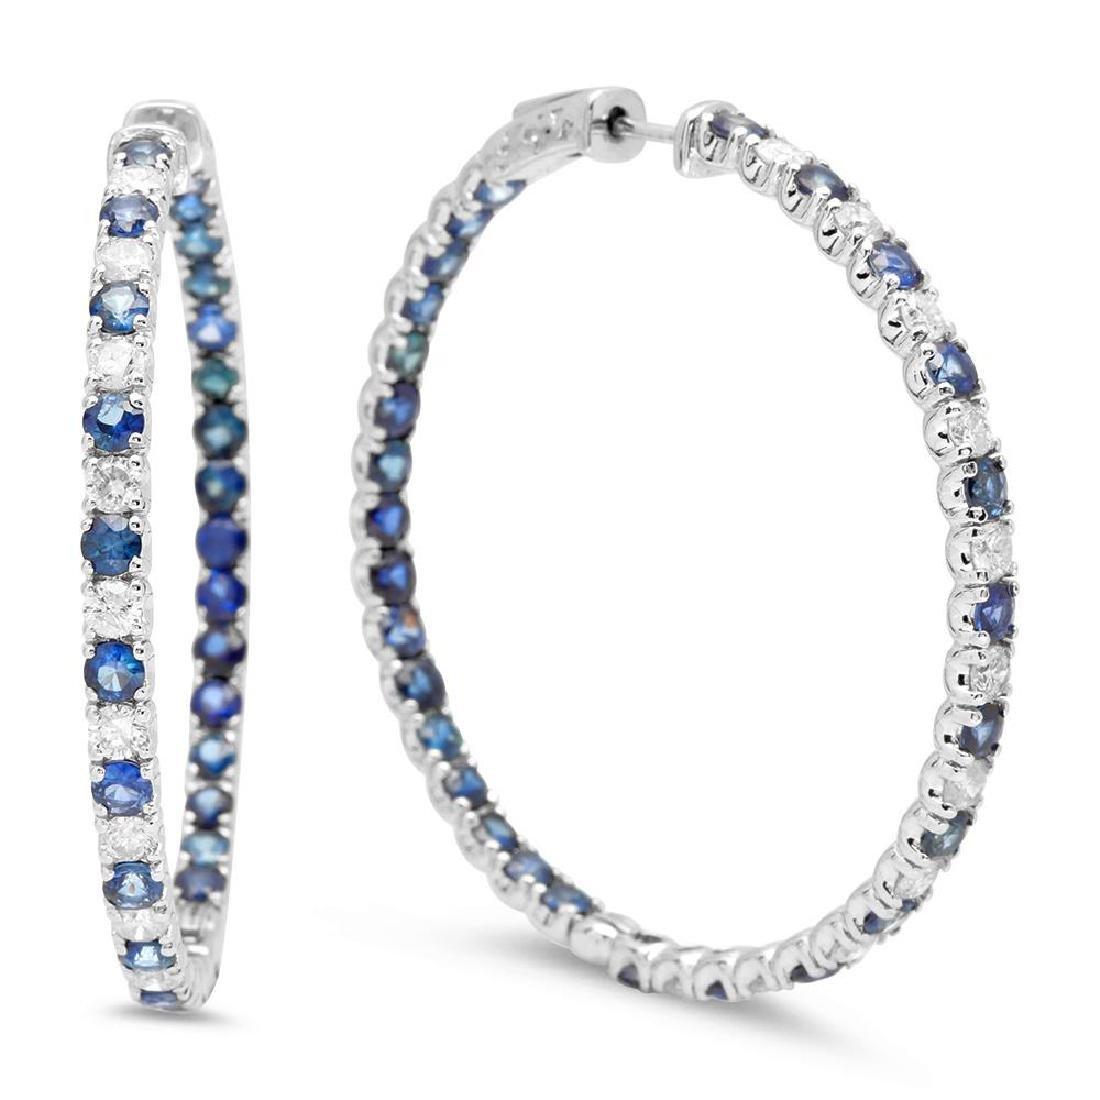 14K Gold 7.86ct Sapphire 2.32cts Diamond Earrings